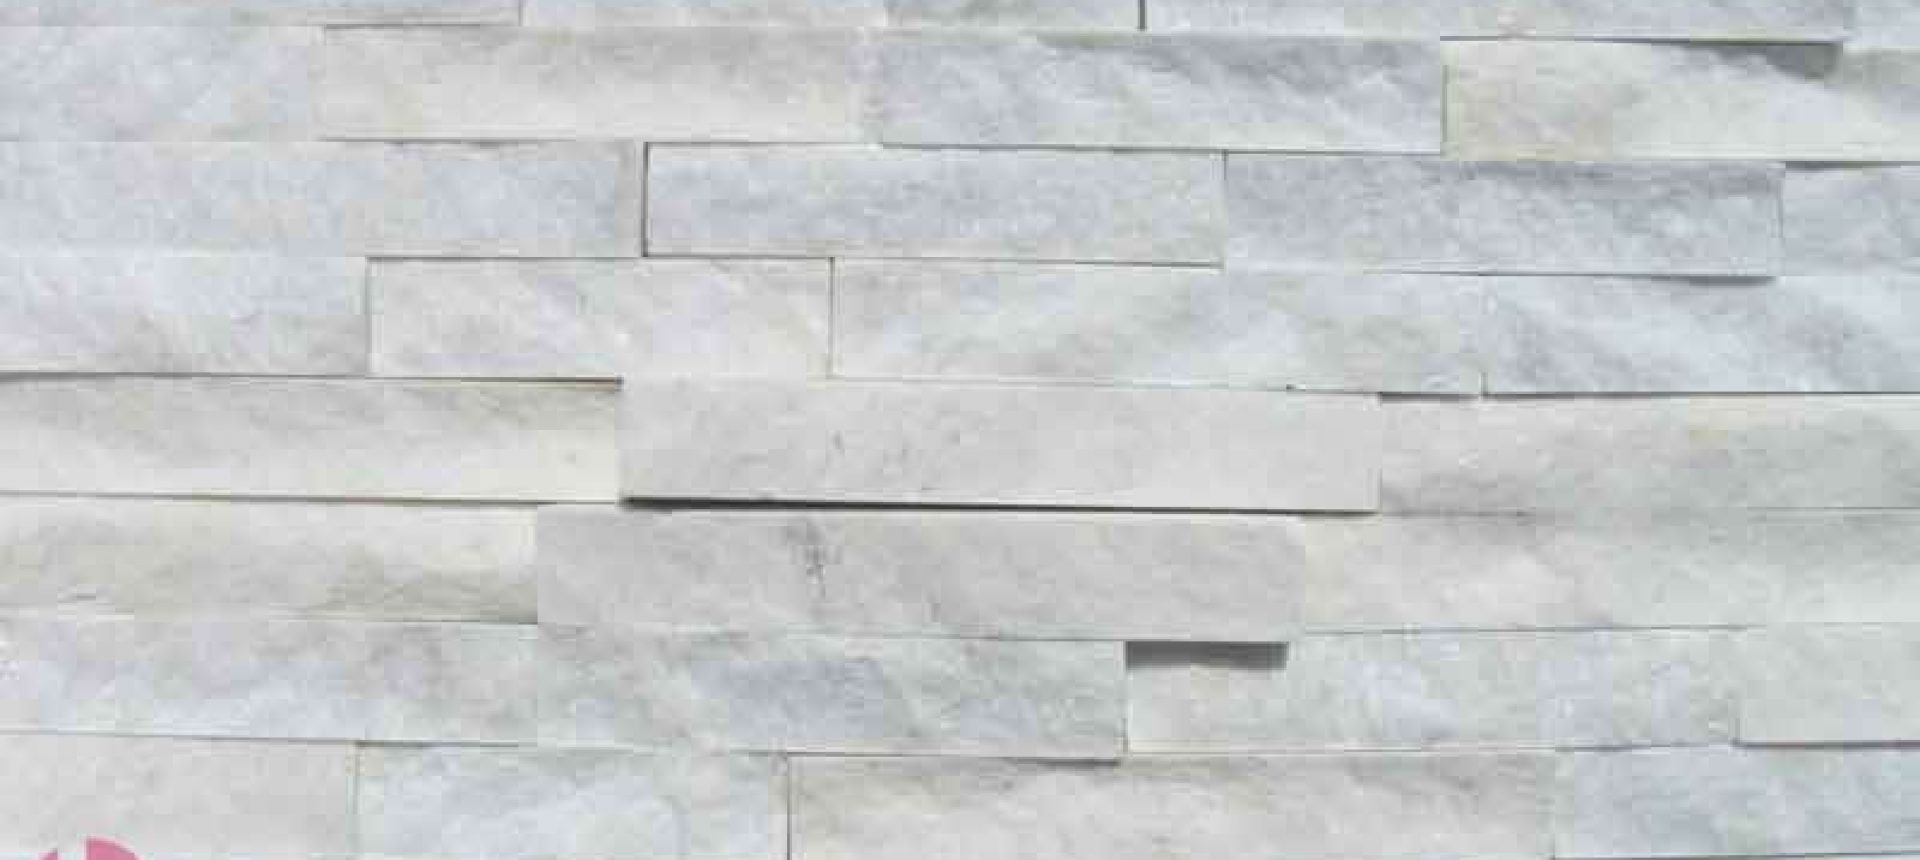 Beli-kvarc-prirodni-kamen